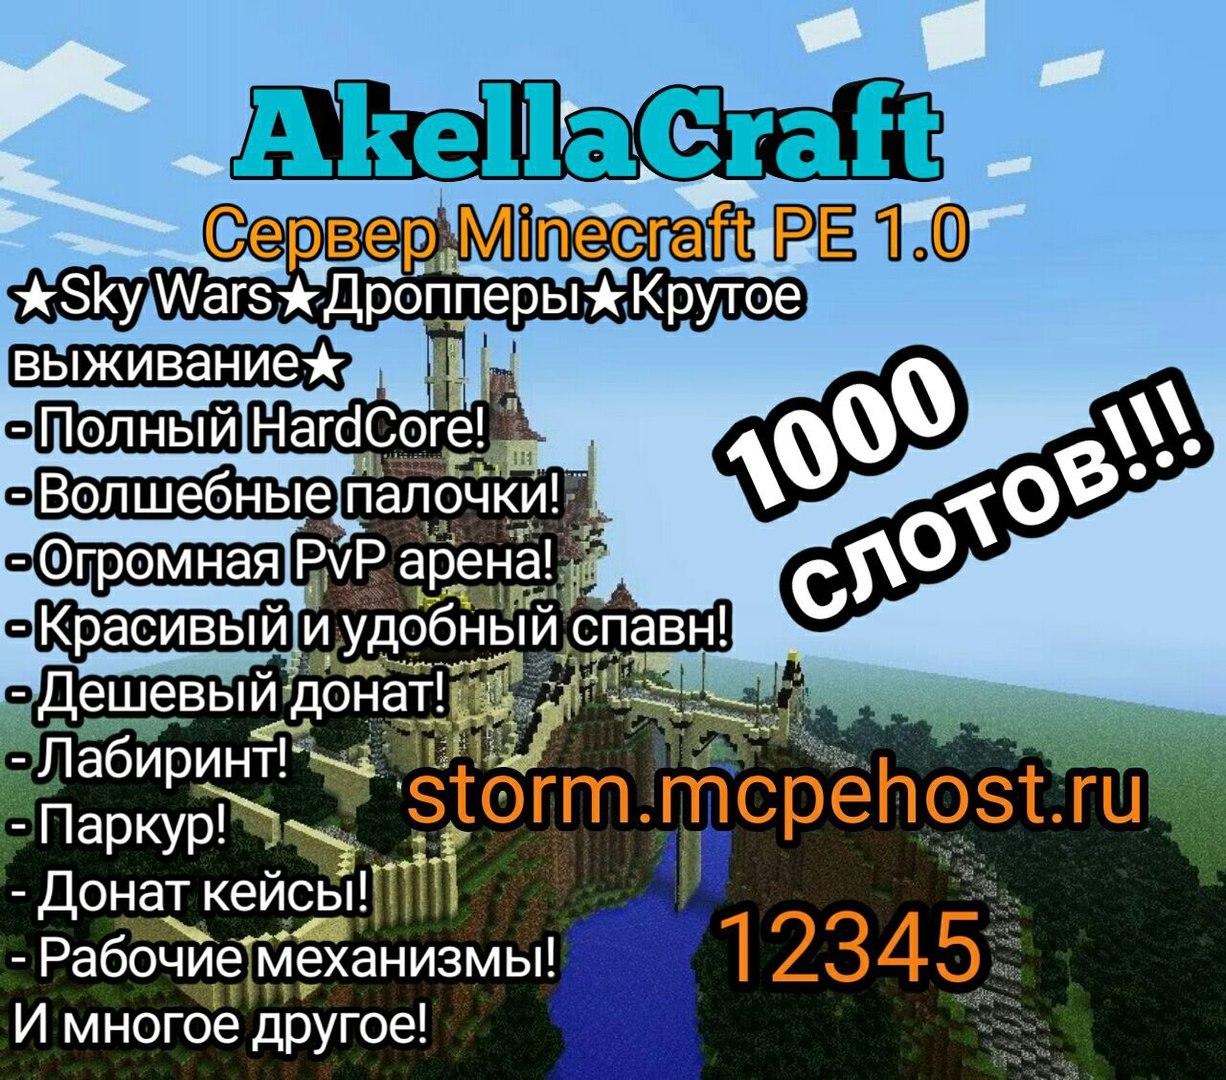 AkellaCraft сервер для Minecraft PE 1.0